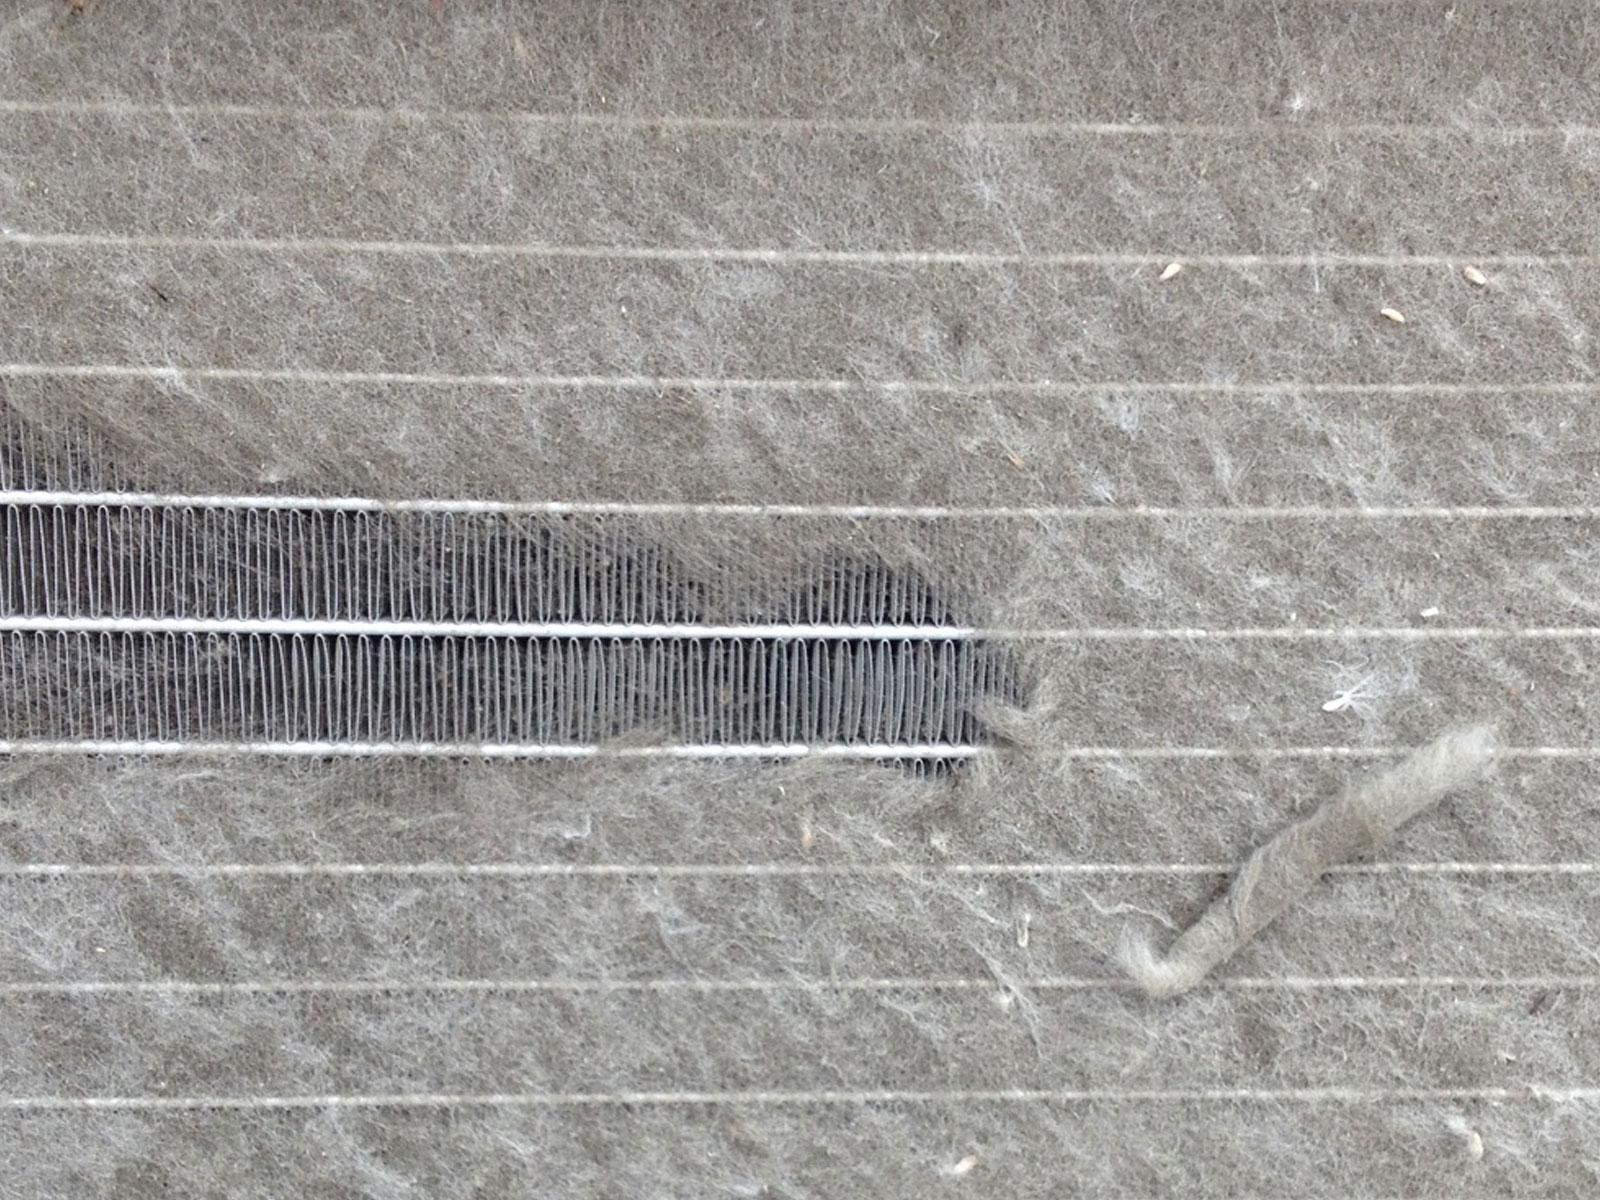 Clogged Coil Fins Restrict Critical Air Flow